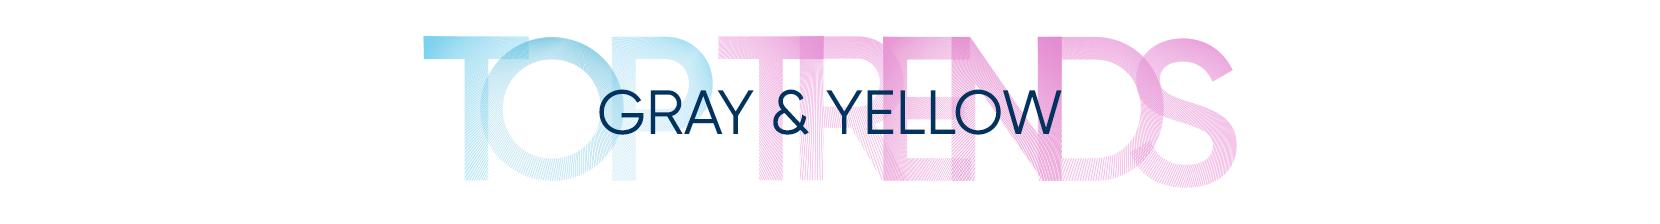 top trends. gray & yellow